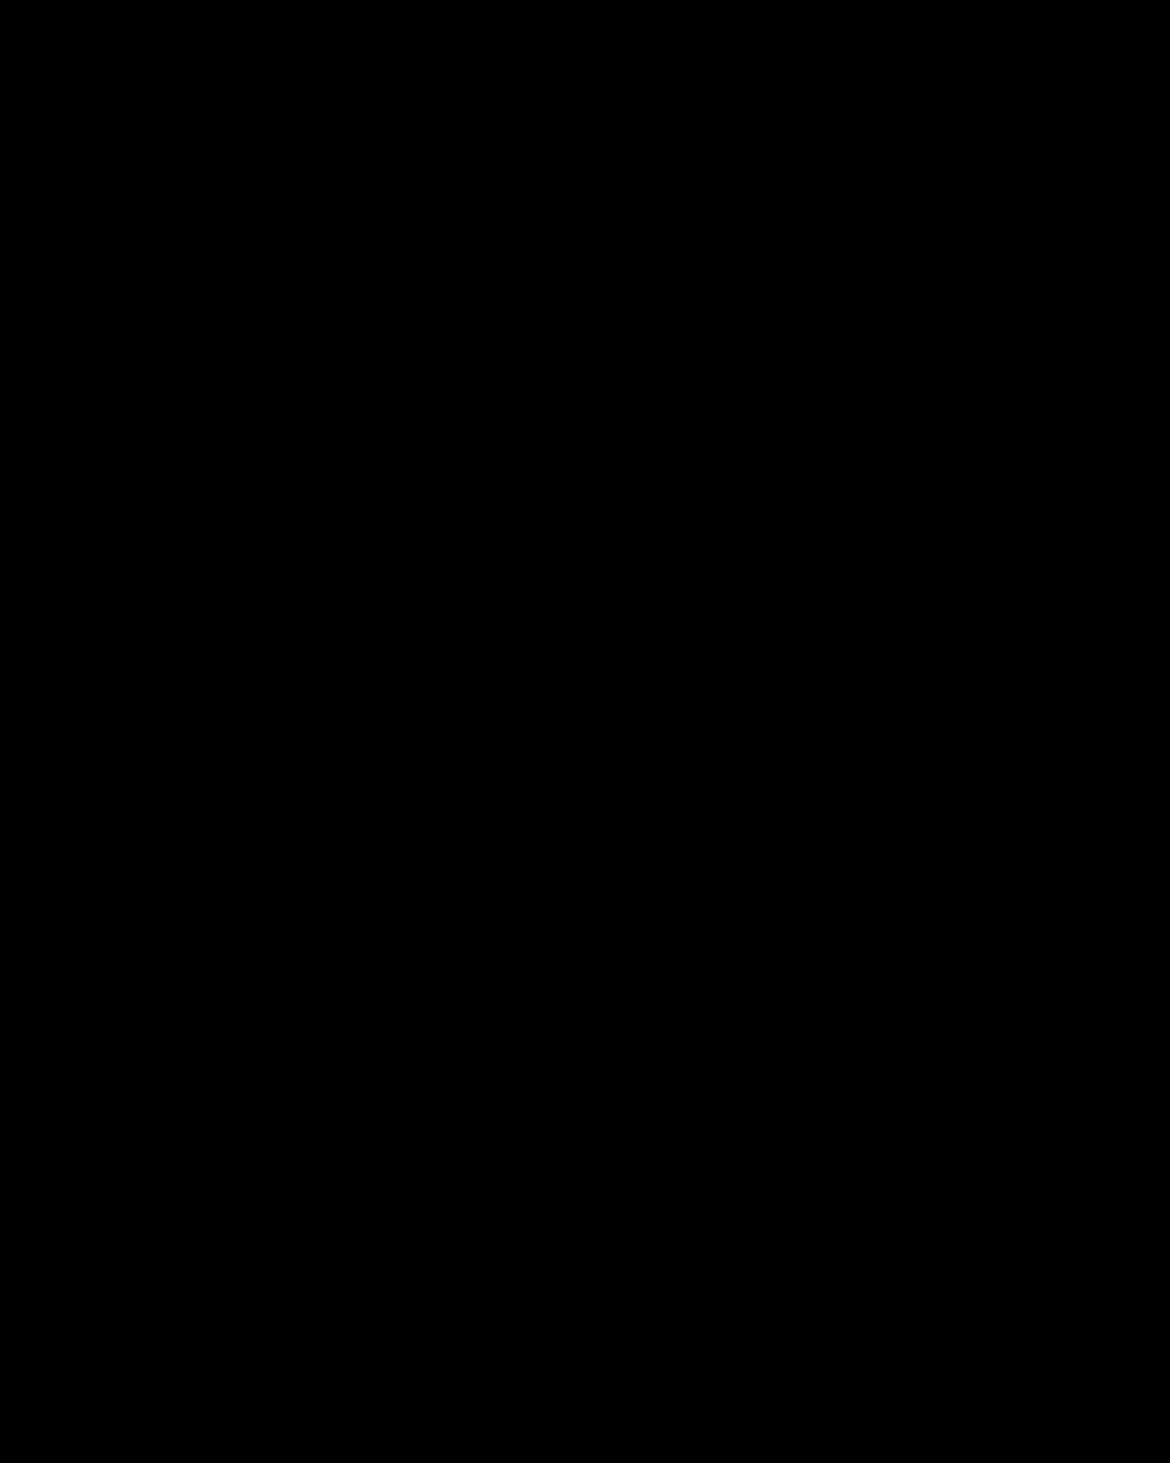 Hiltl Roof Terrace - Laura Comolli, Zurigo in 24 ore con De Marquet